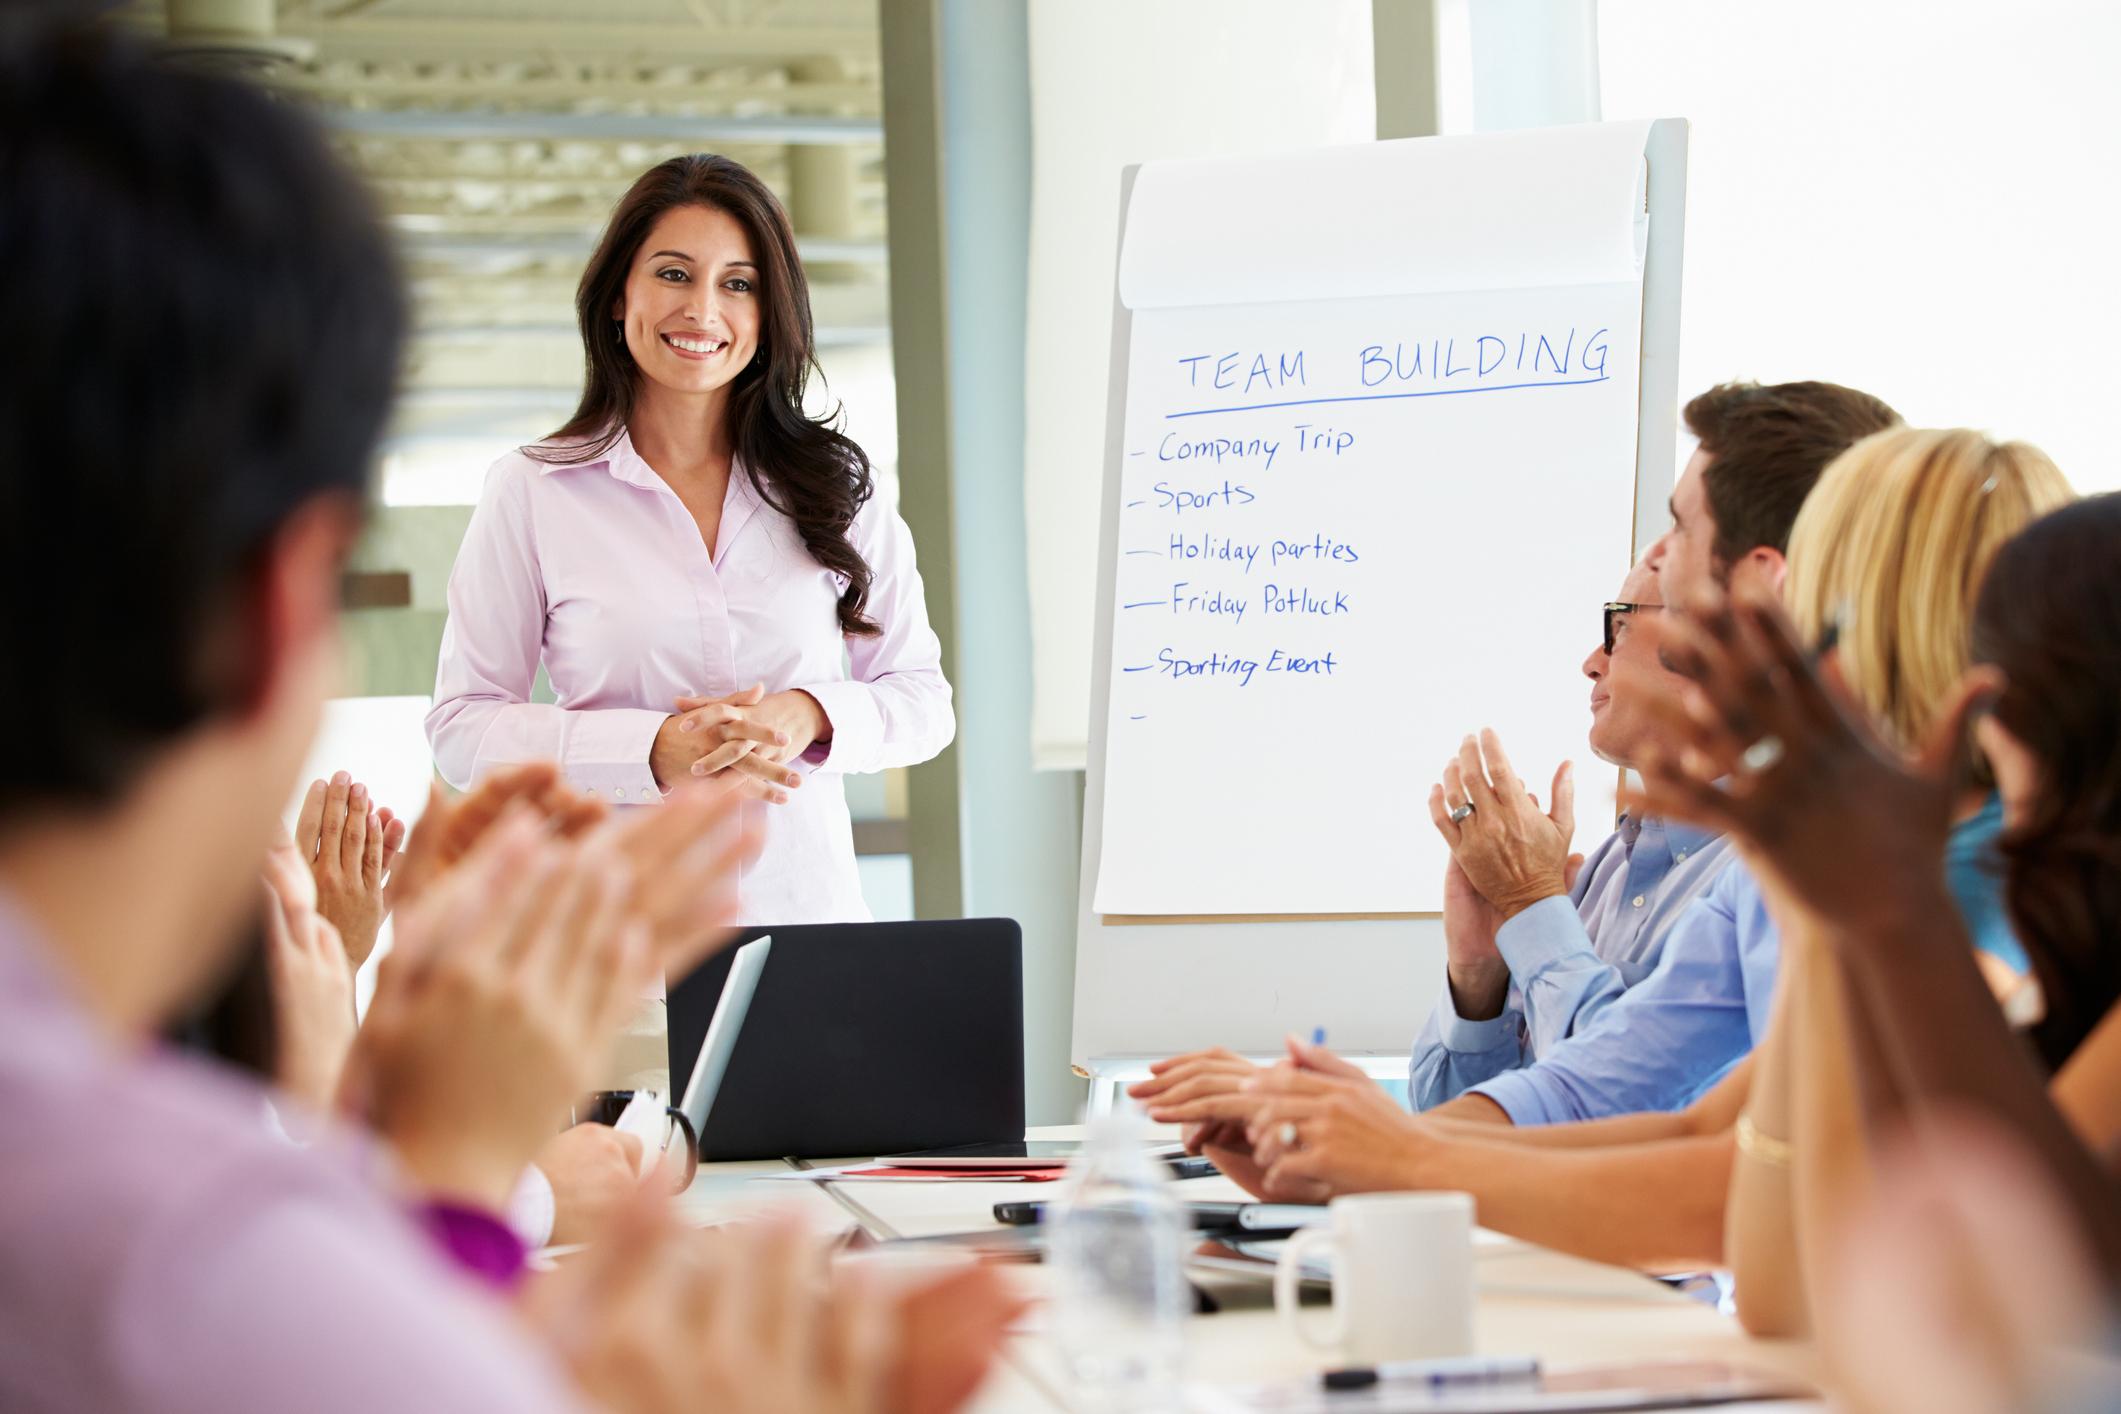 Businesswoman Addressing Meeting Around Boardroom Table In Smart/Casual Dresswear